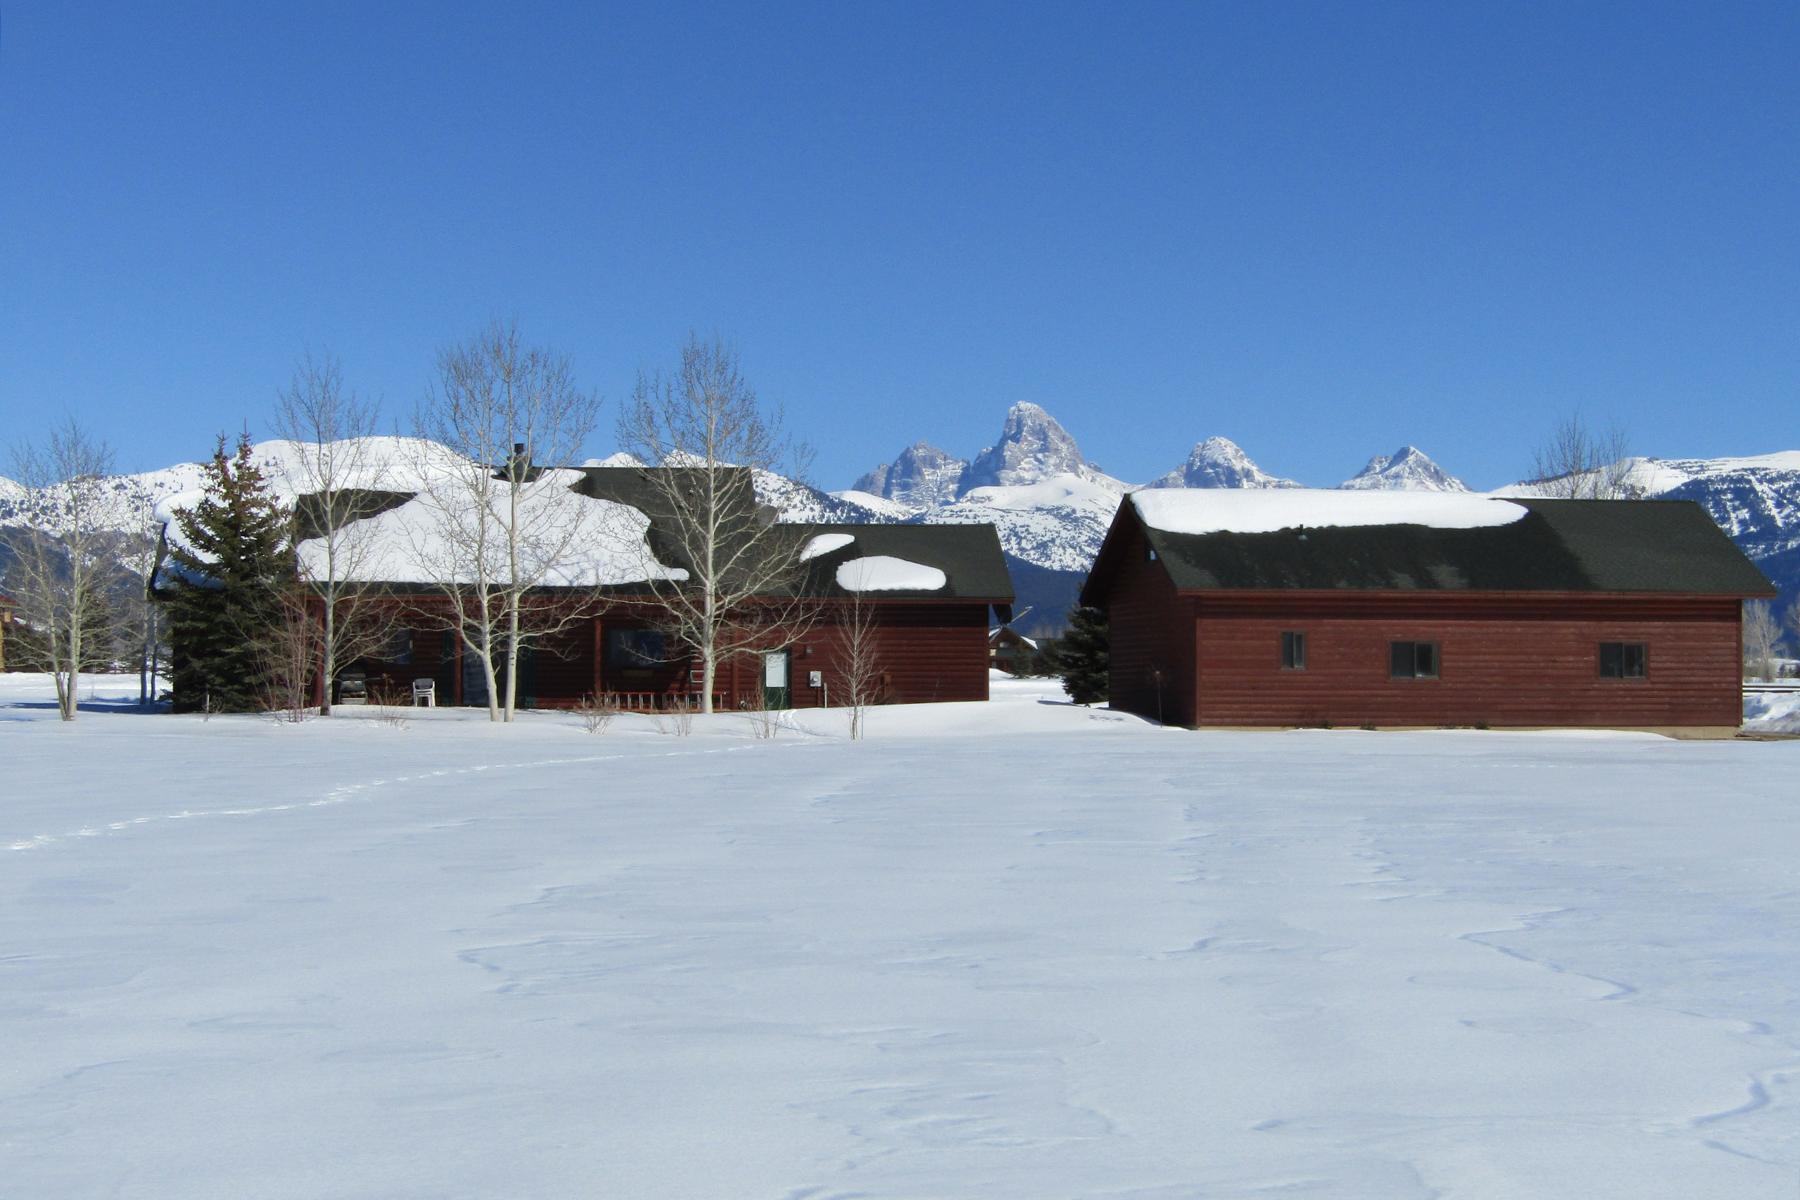 Single Family Home for Active at 4852 Renegade Dr Tetonia, Idaho 83452 United States